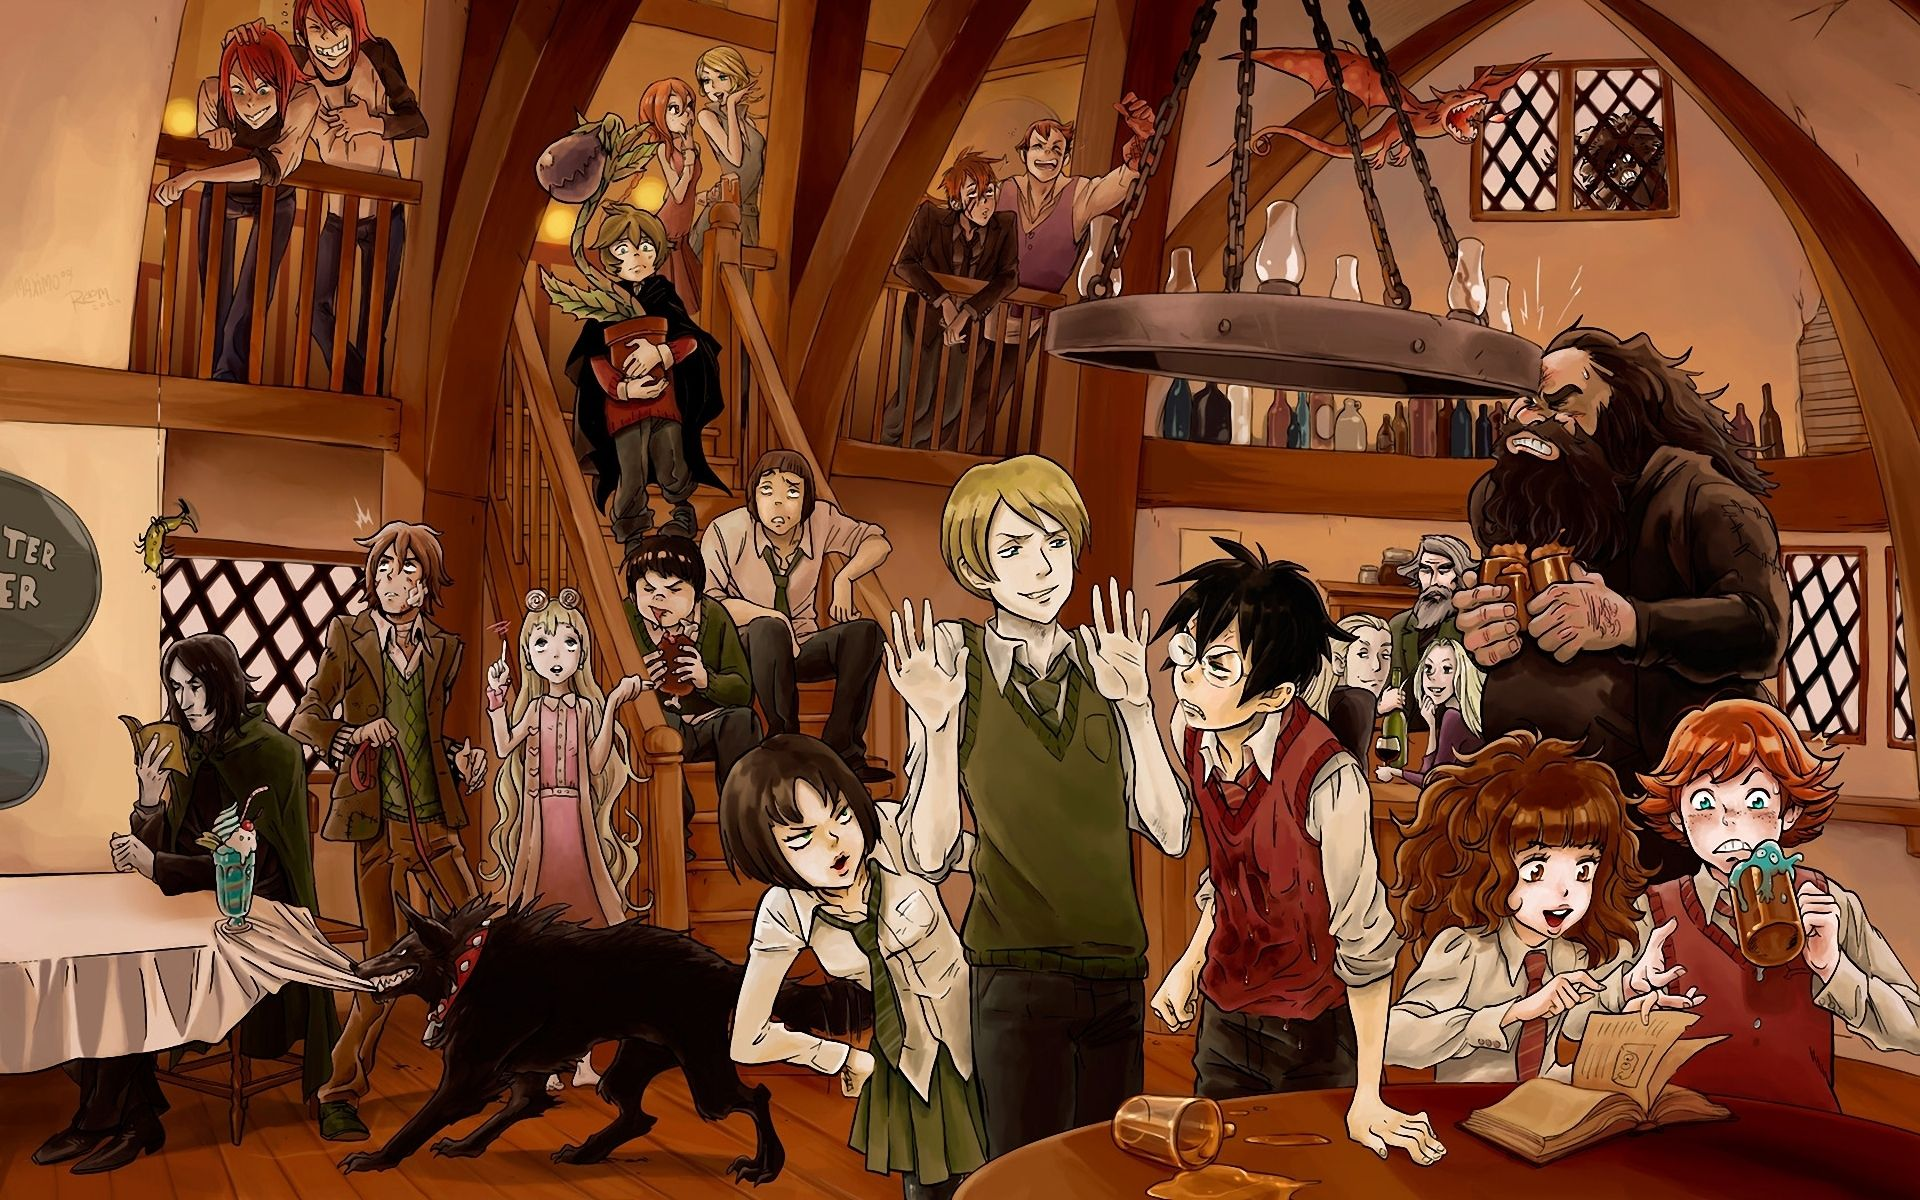 Good Wallpaper Harry Potter Fanart - a039c02130dfeea24100cff5017b1797  HD_21393.jpg